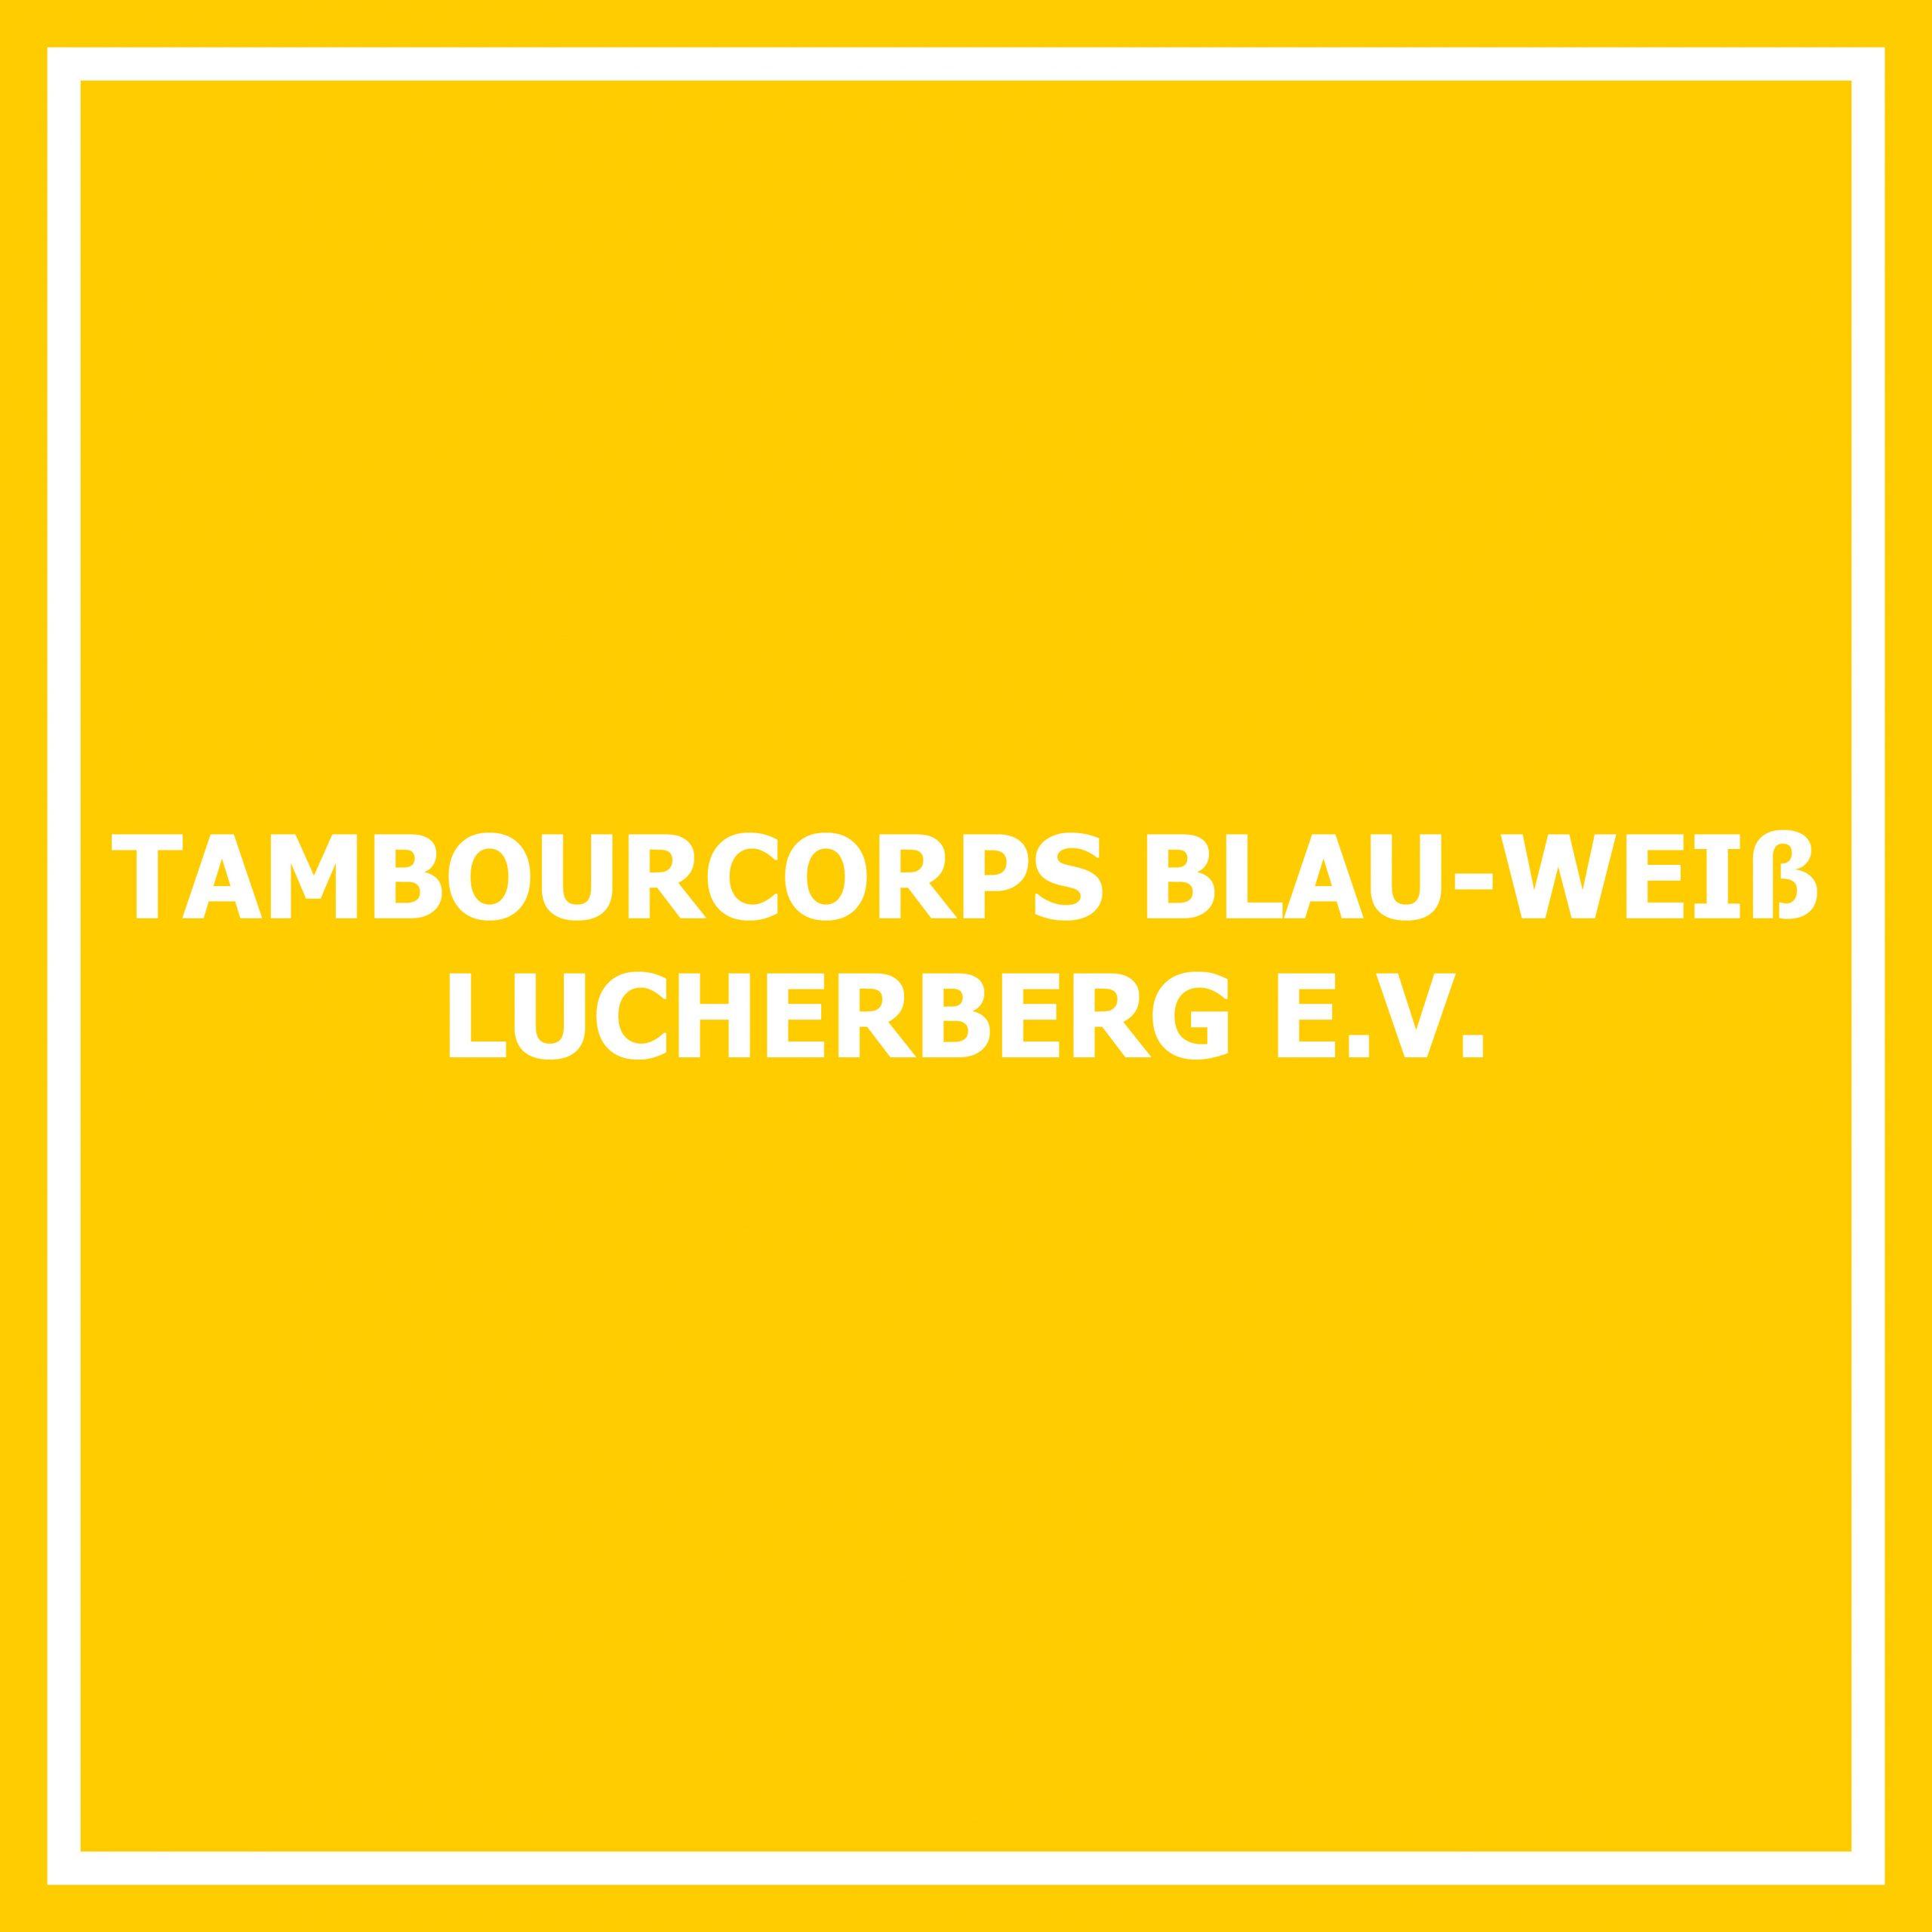 Tambourcorps Blau-Weiß Lucherberg e. V.